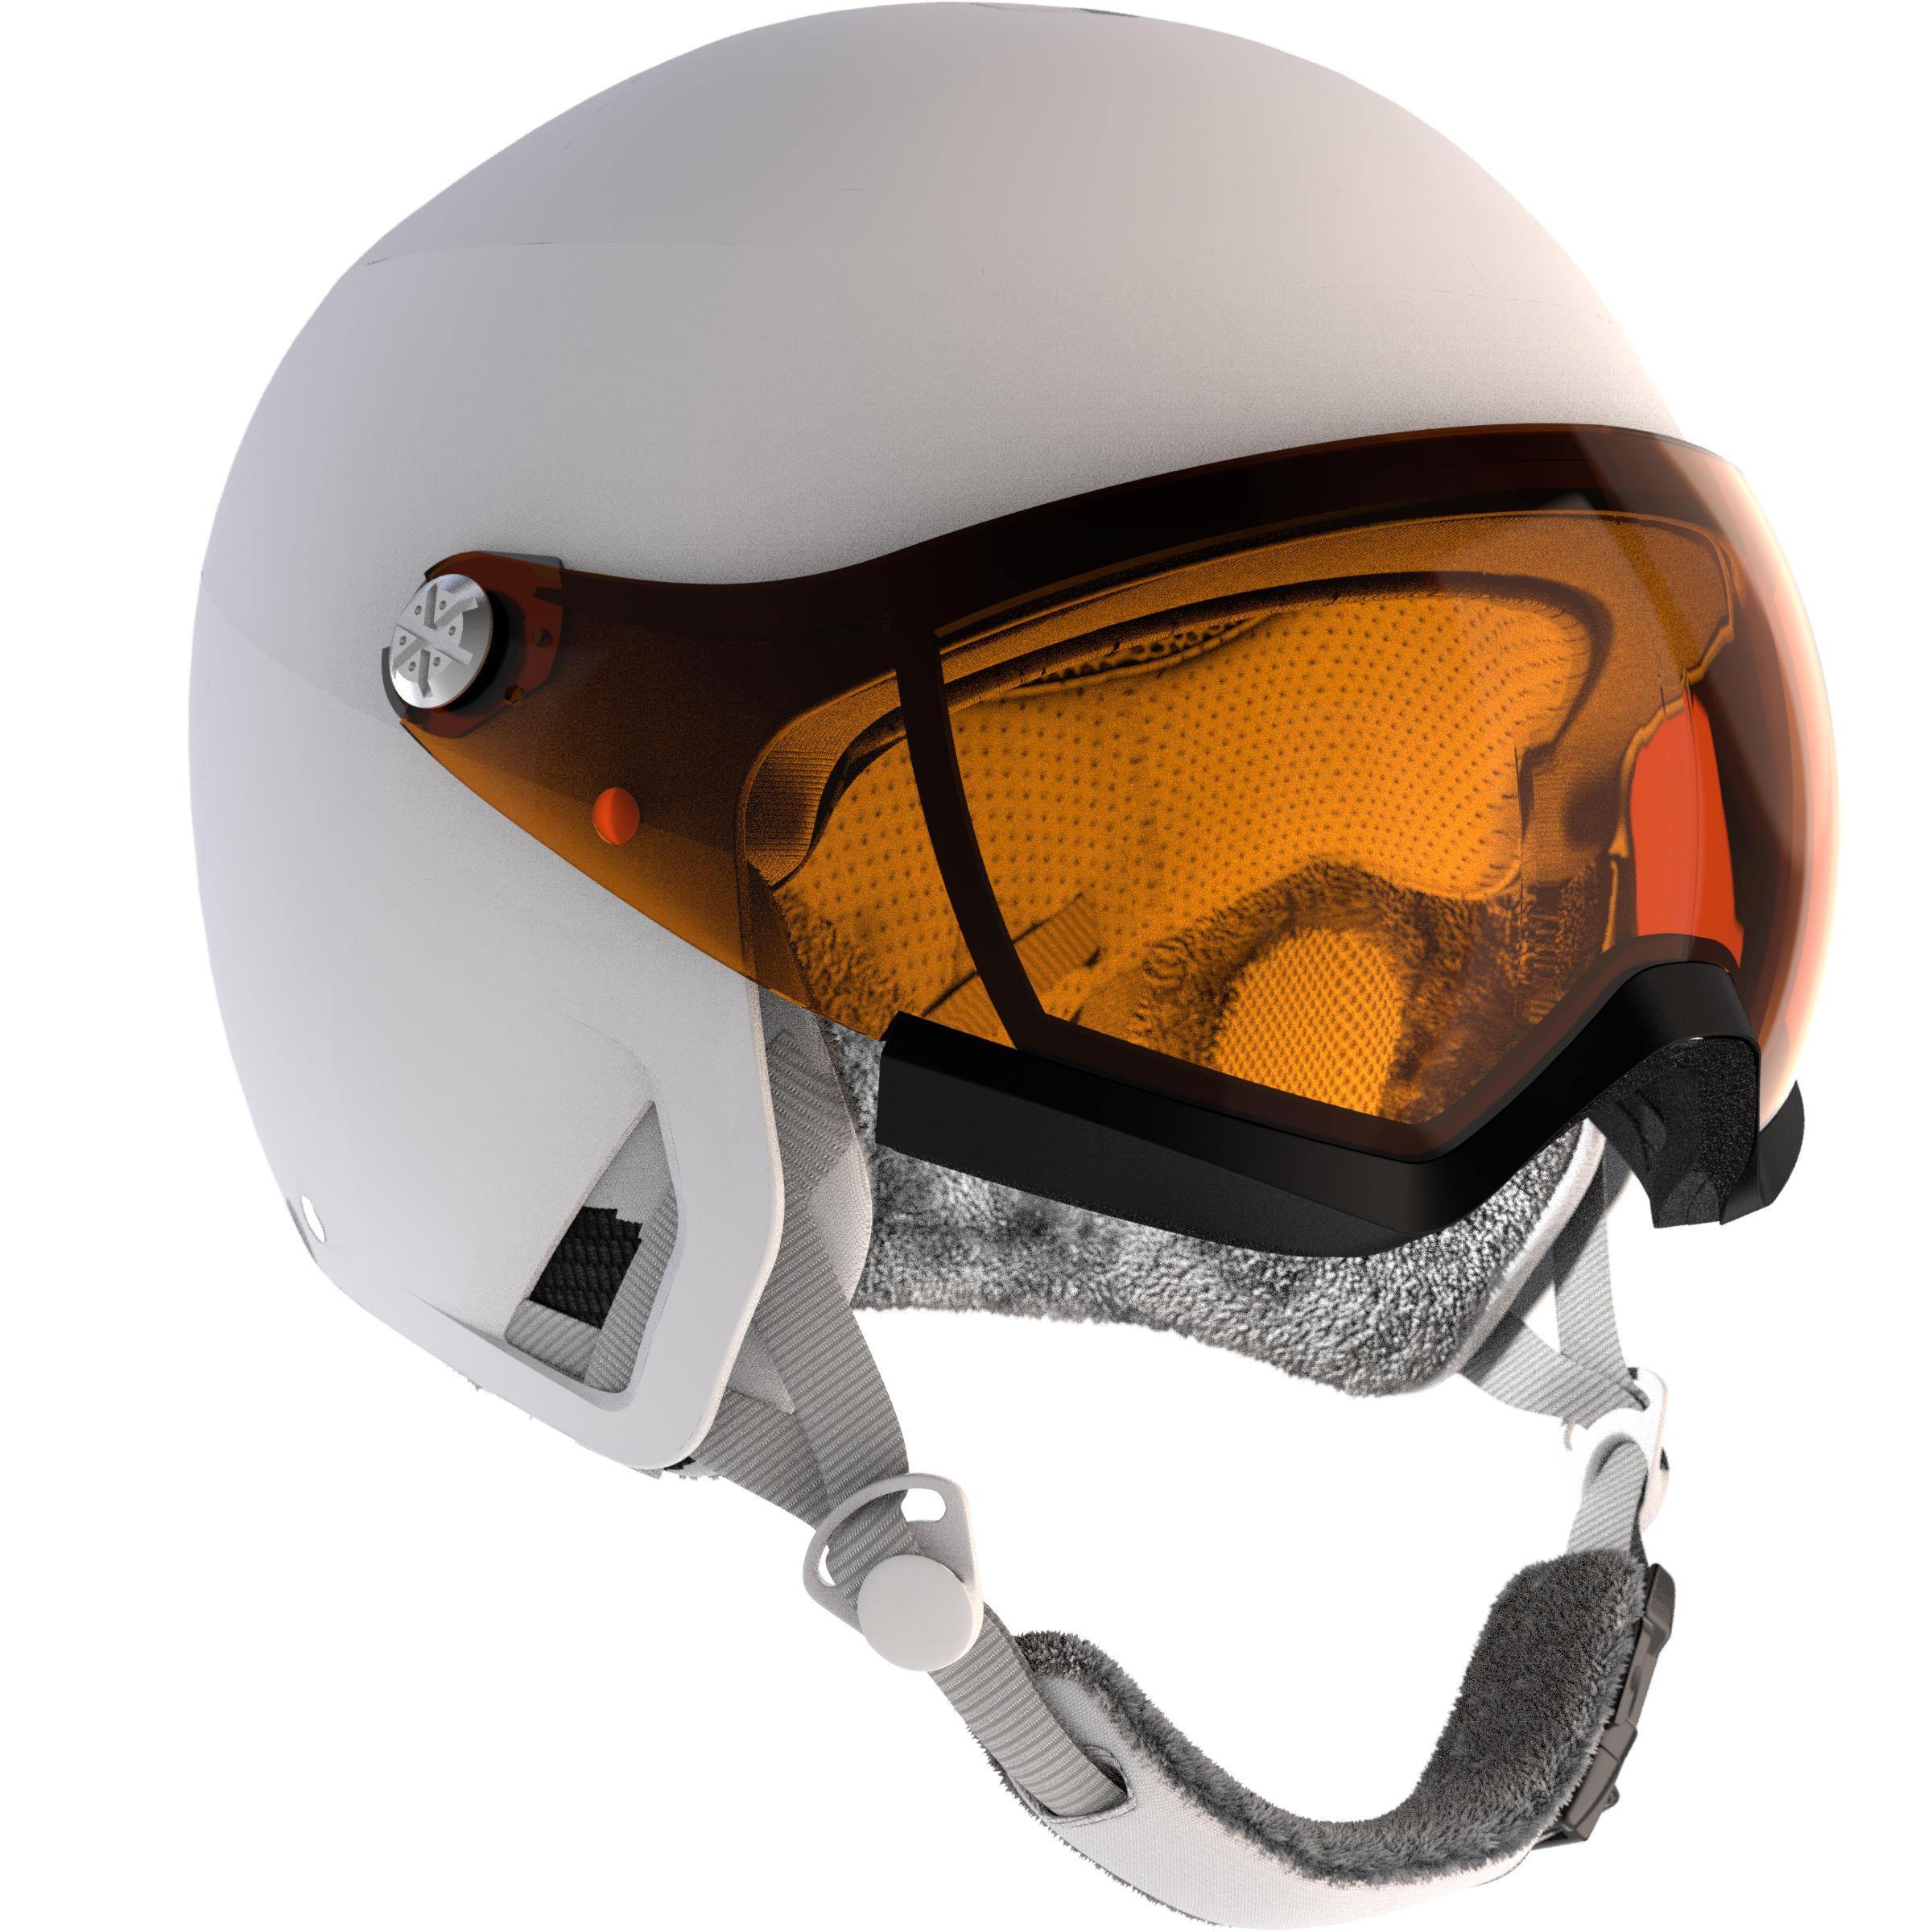 61e3952ae79 Comprar Cascos de Snowboard Online